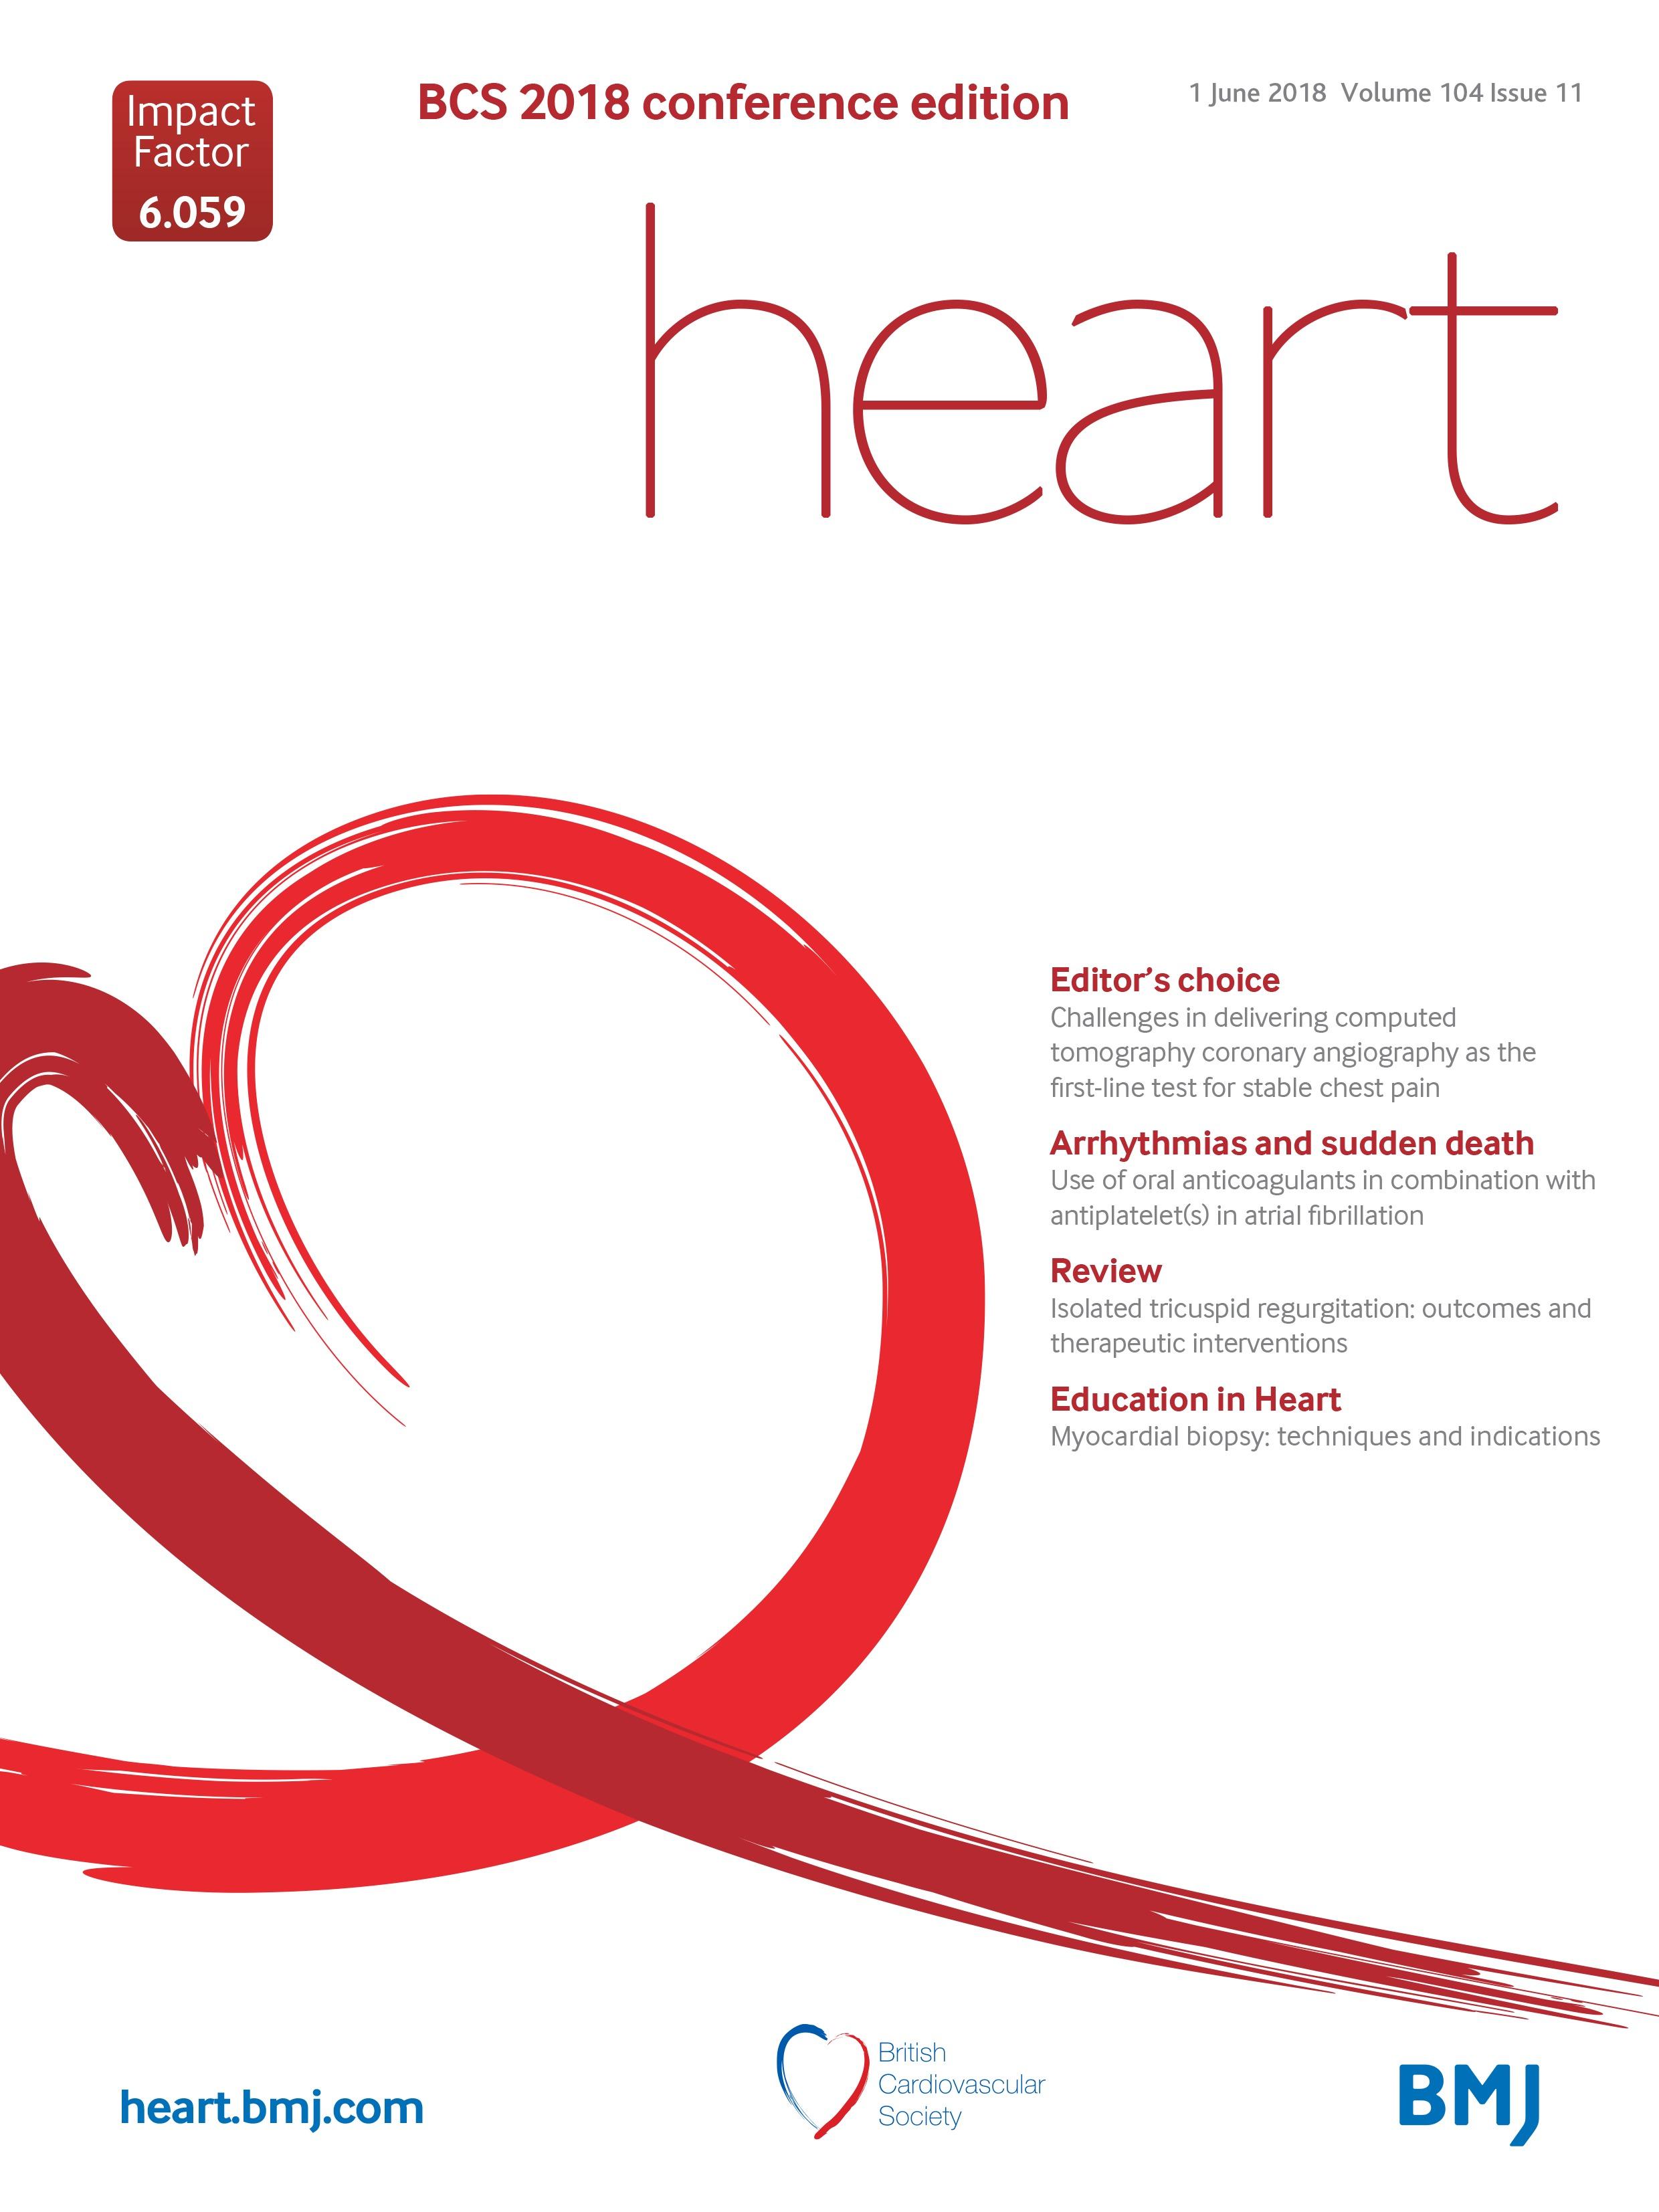 High-sensitivity cardiac troponin I and risk of